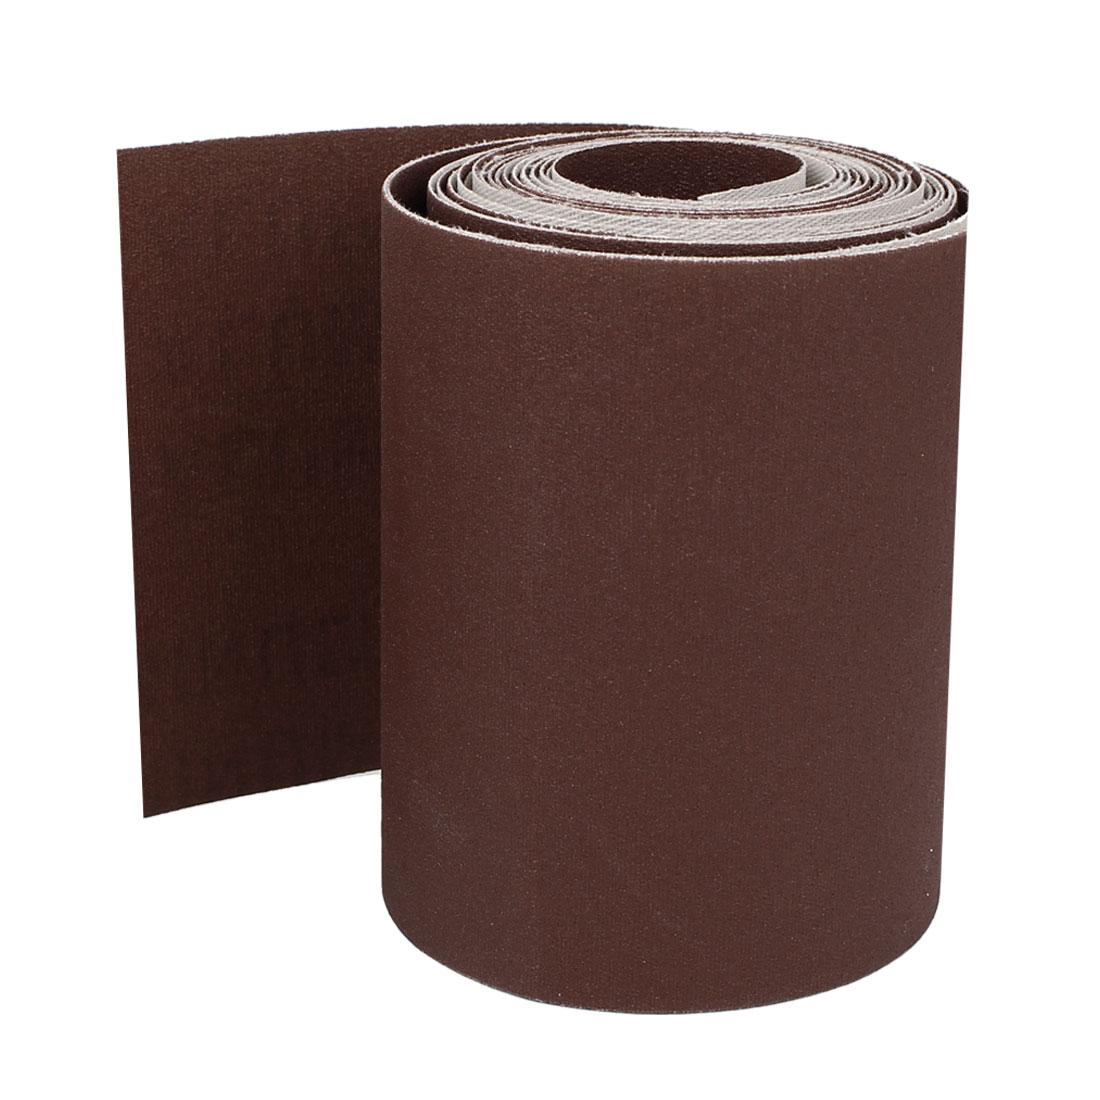 5M Long 100mm Width 320 Grit Abrasive Sanding Sand Paper Sandpaper